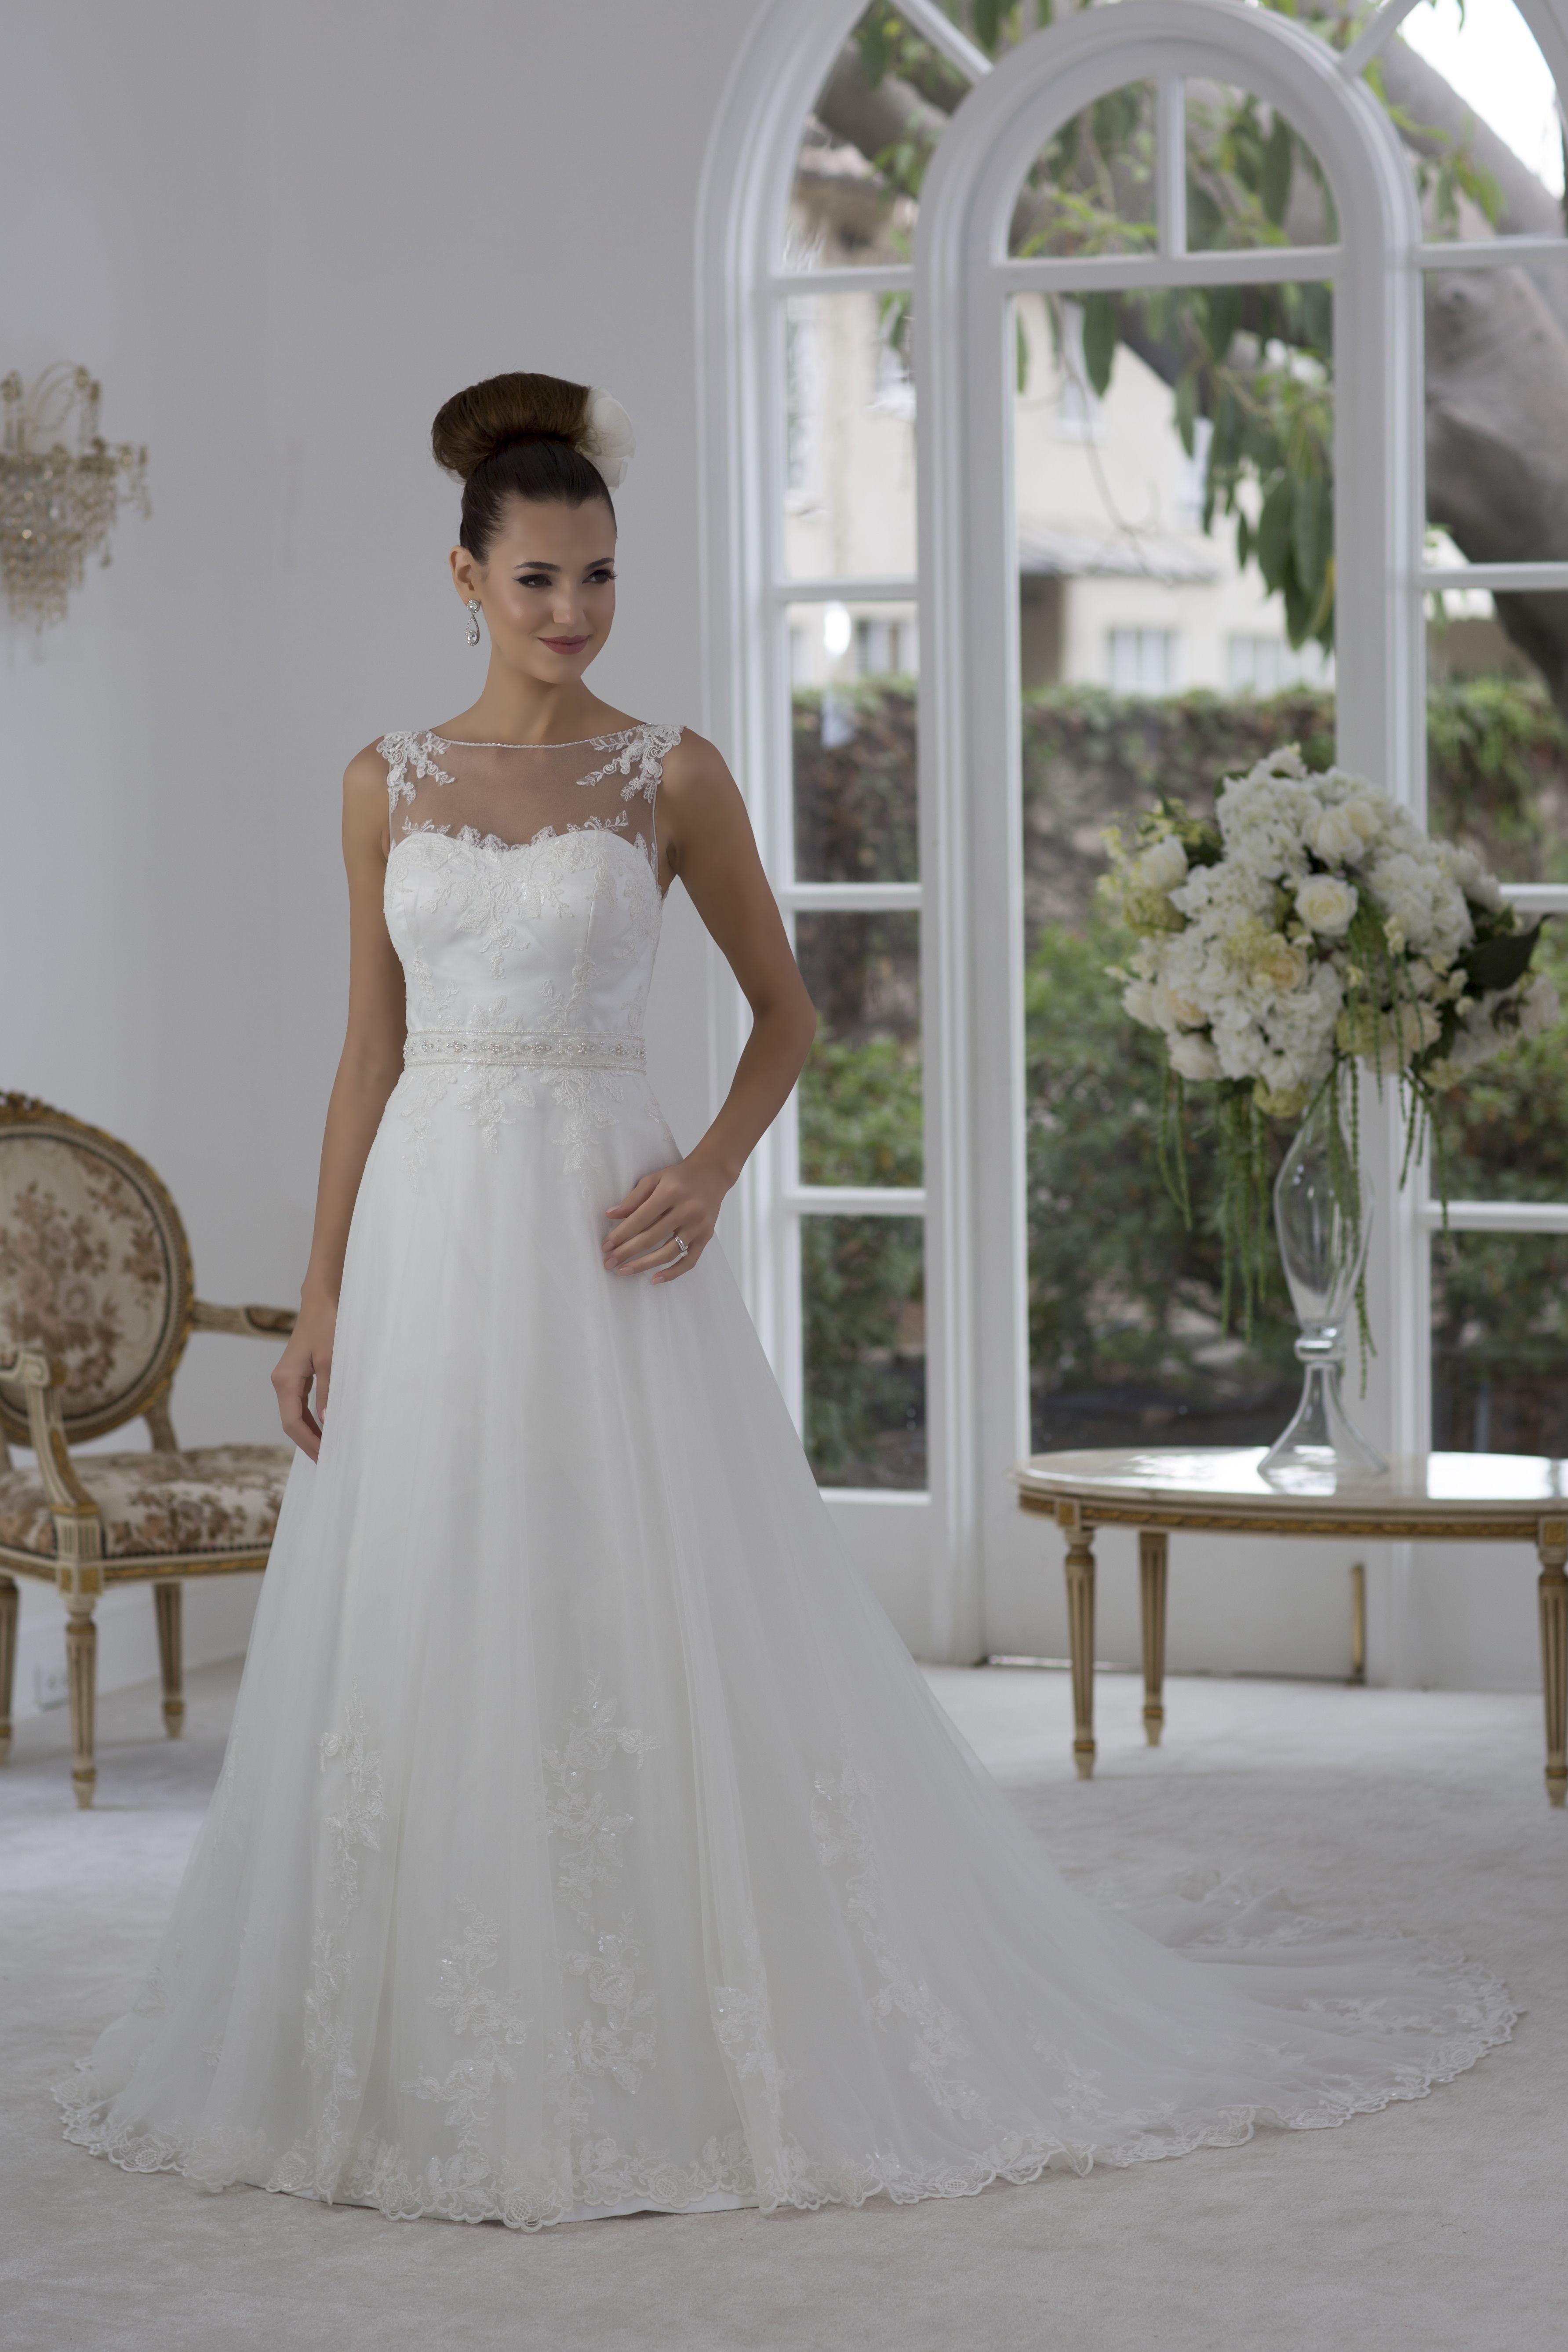 Beautiful Princess Wedding Dress From Finesse Bridal Wear In Listowel Co Kerry PrincessDress